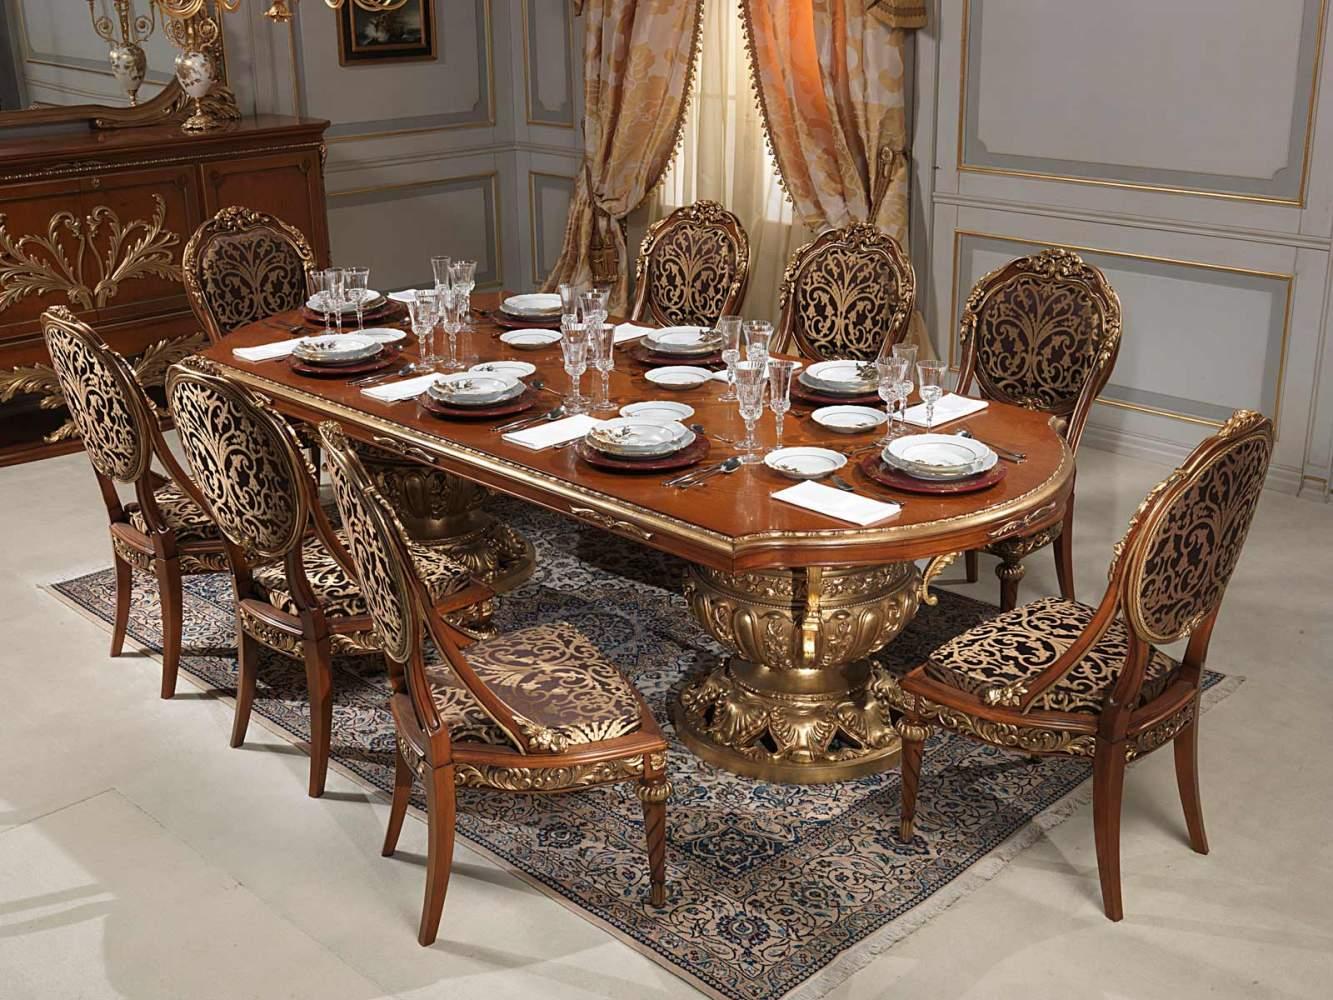 Sala da pranzo Versailles in stile Luigi XVI